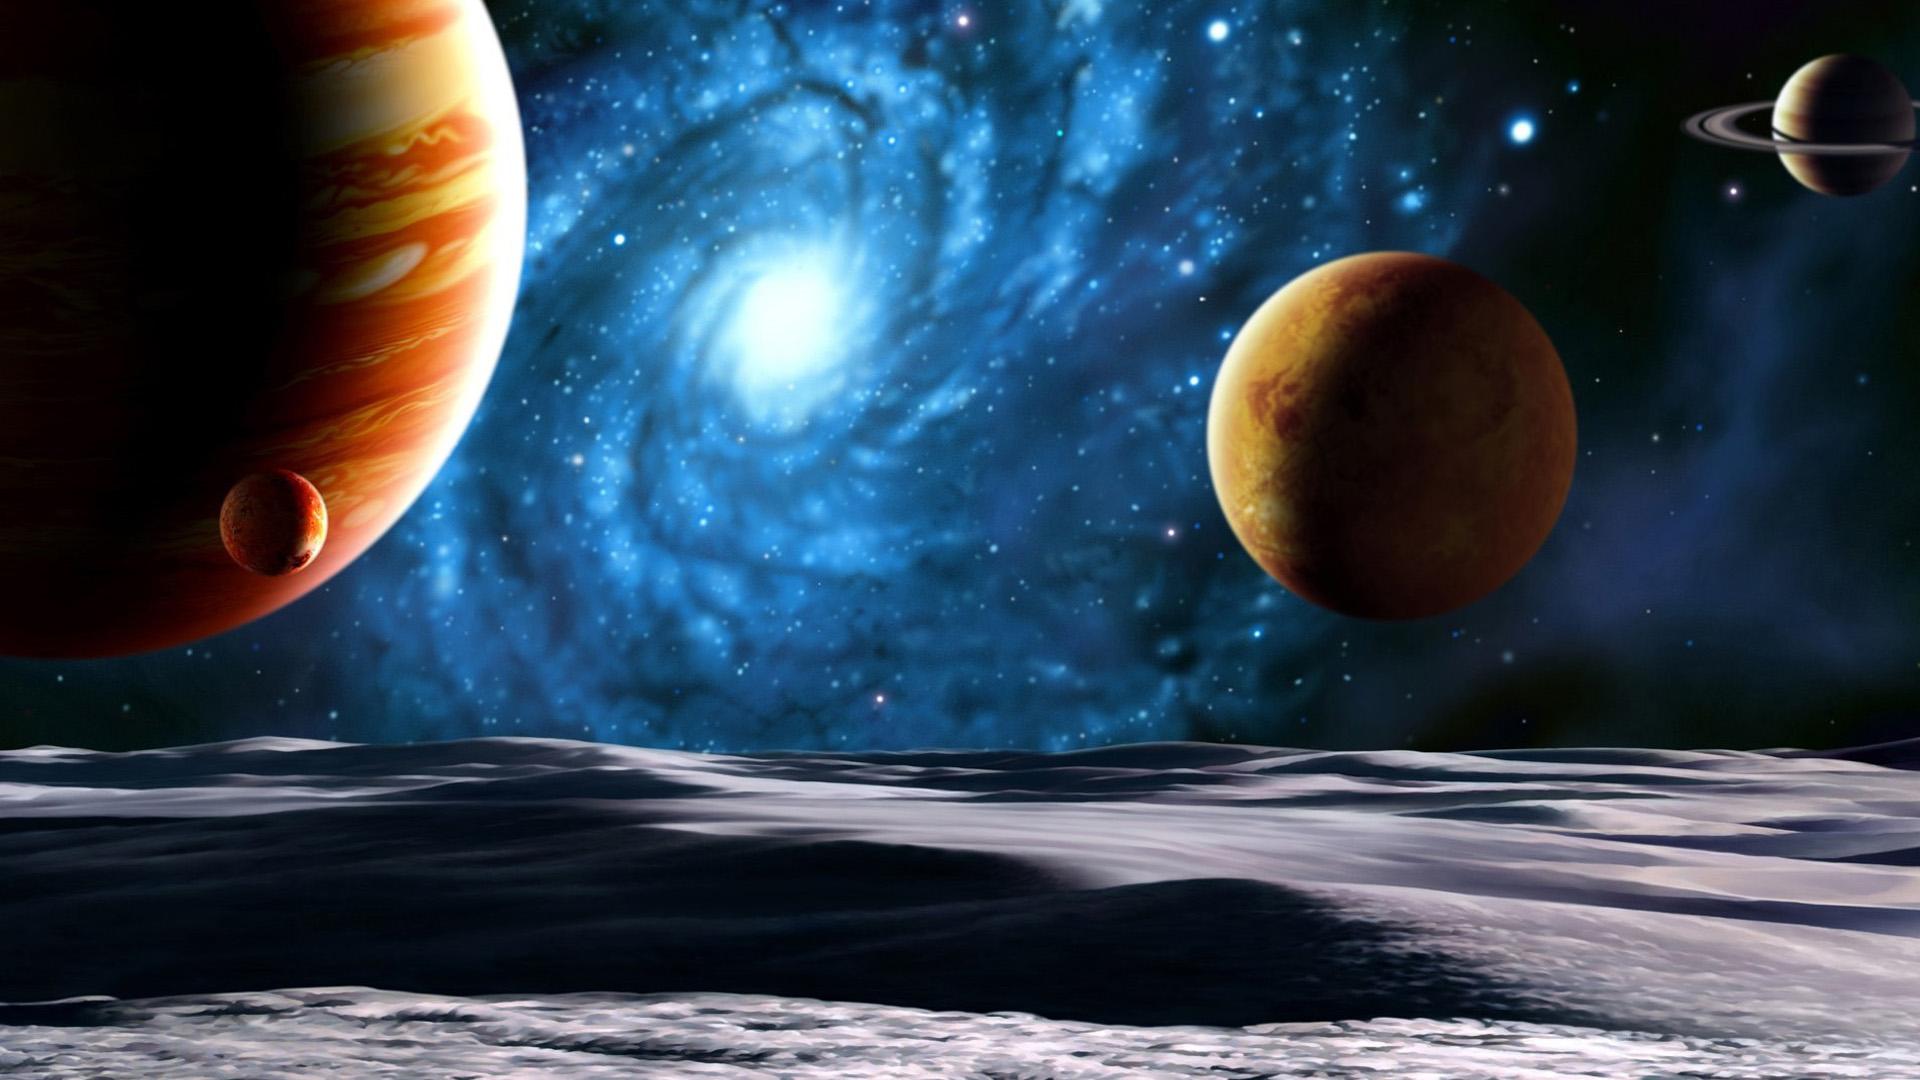 1080p Space Art Background Desktop Wallpapers Planets